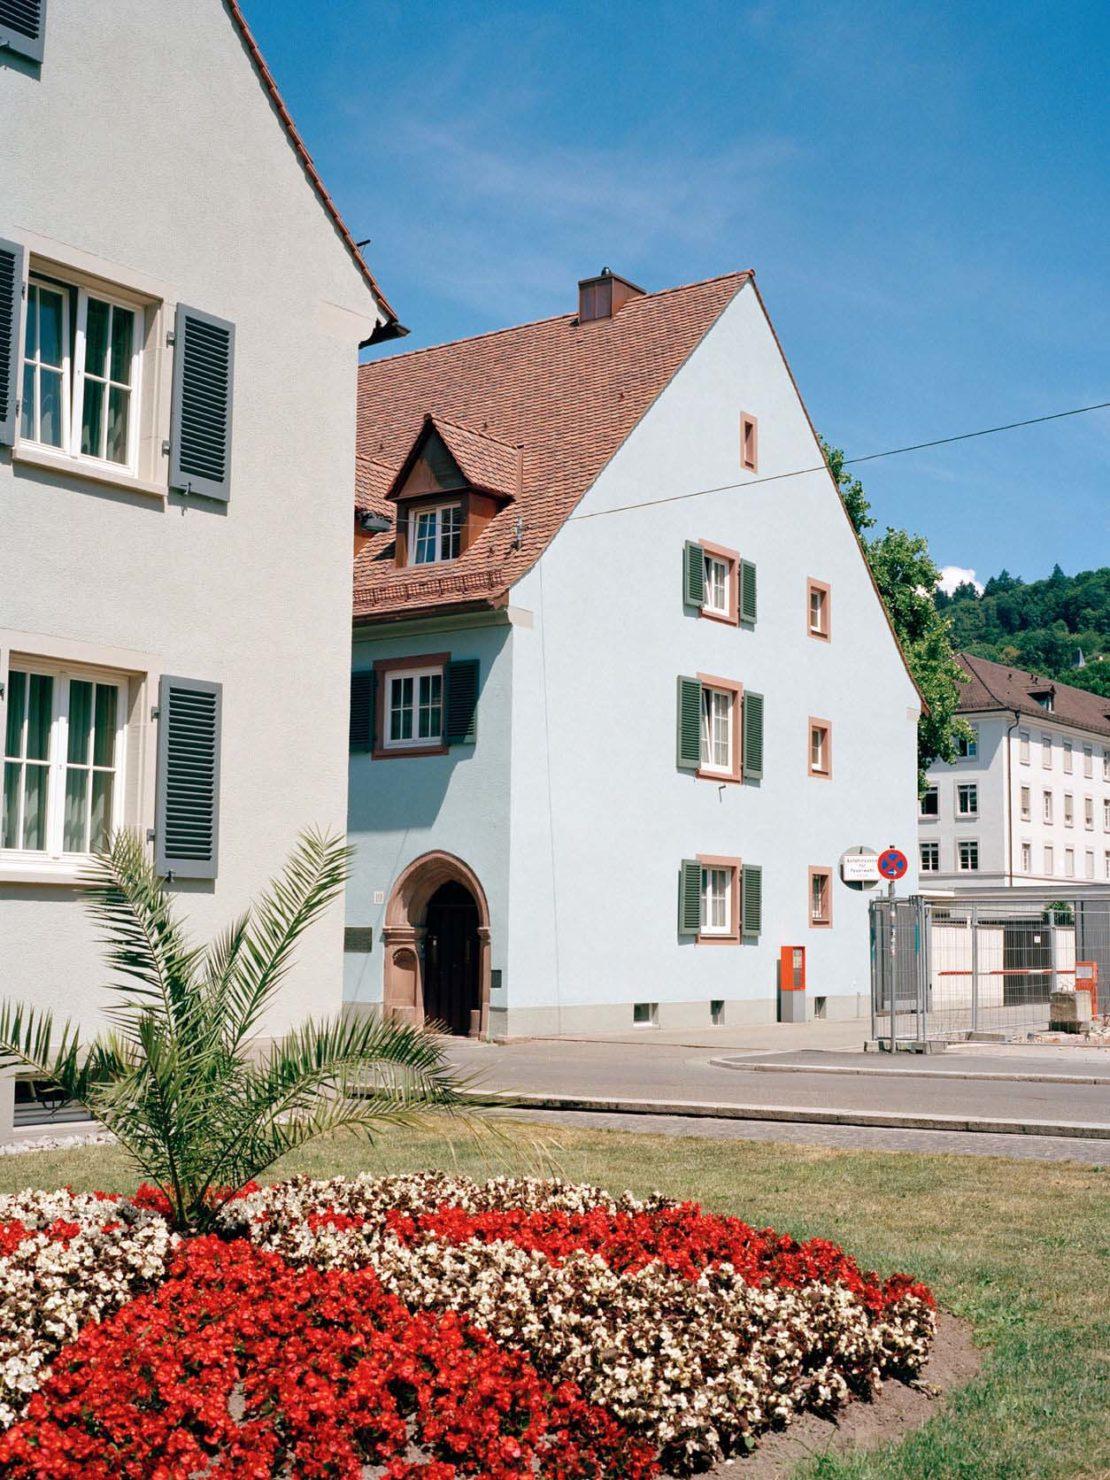 Freiburg's old city